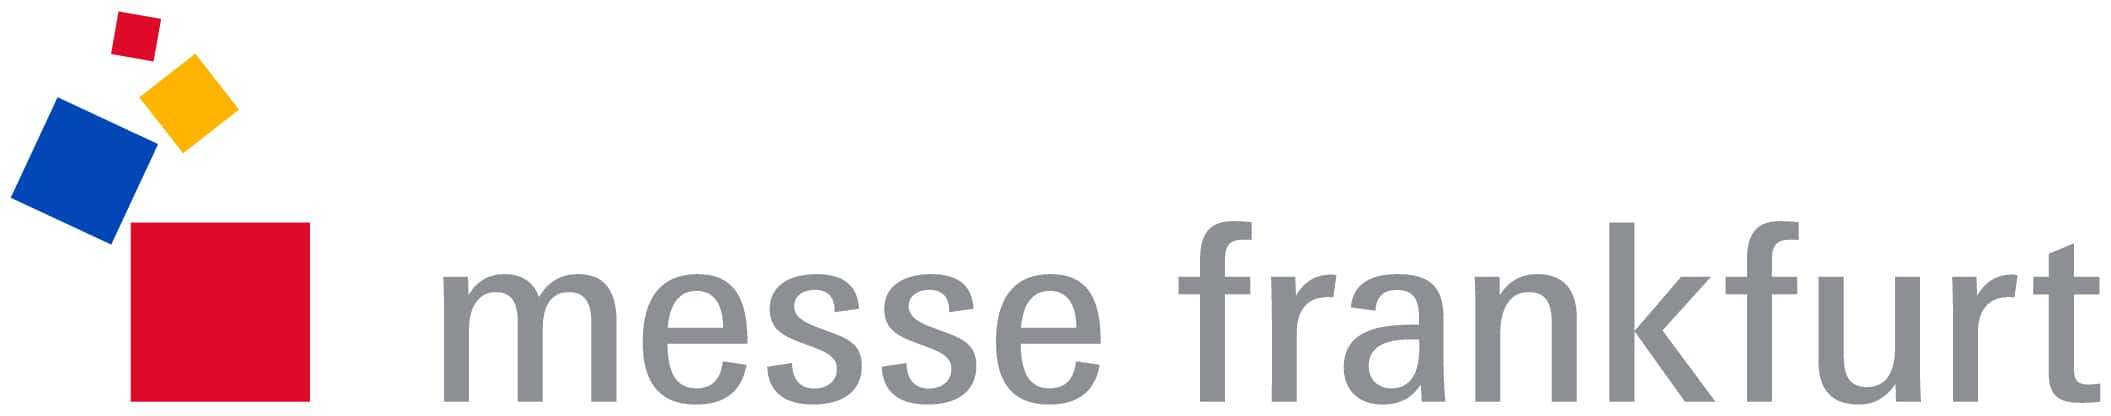 Messe Franfurt